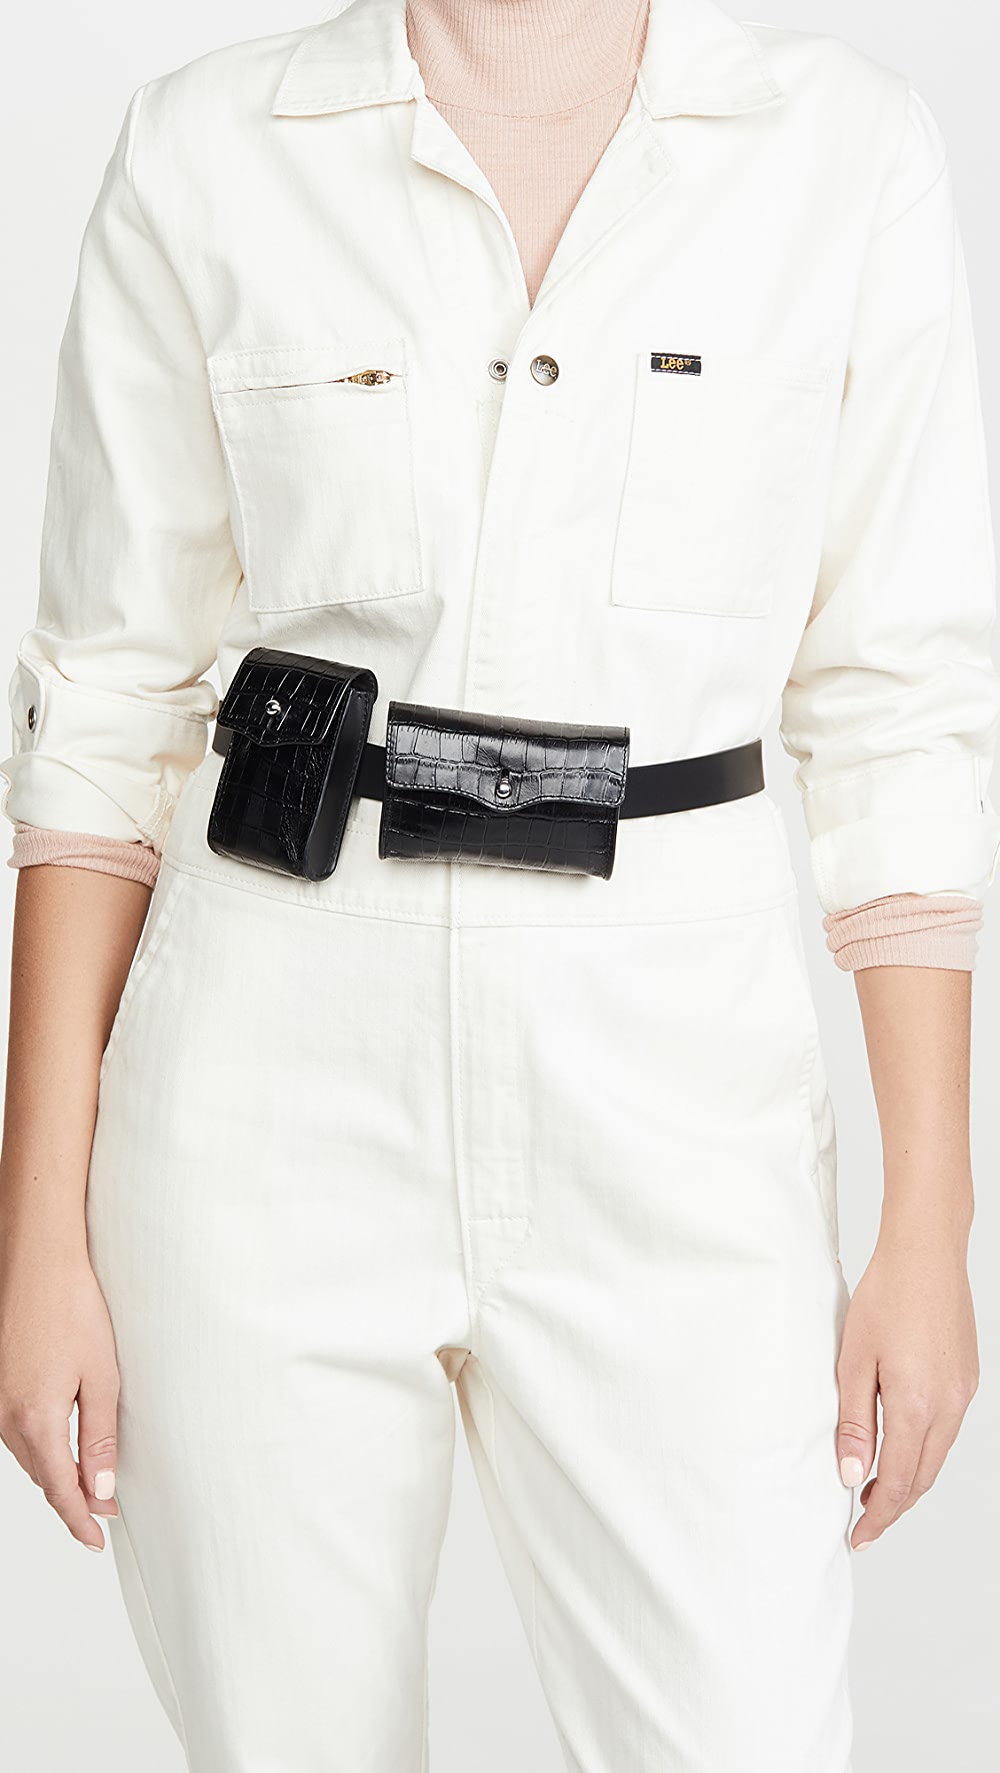 Cheap Price Rebecca Minkoff - 20mm Multi Pouch Belt Bag Colours Are Striking